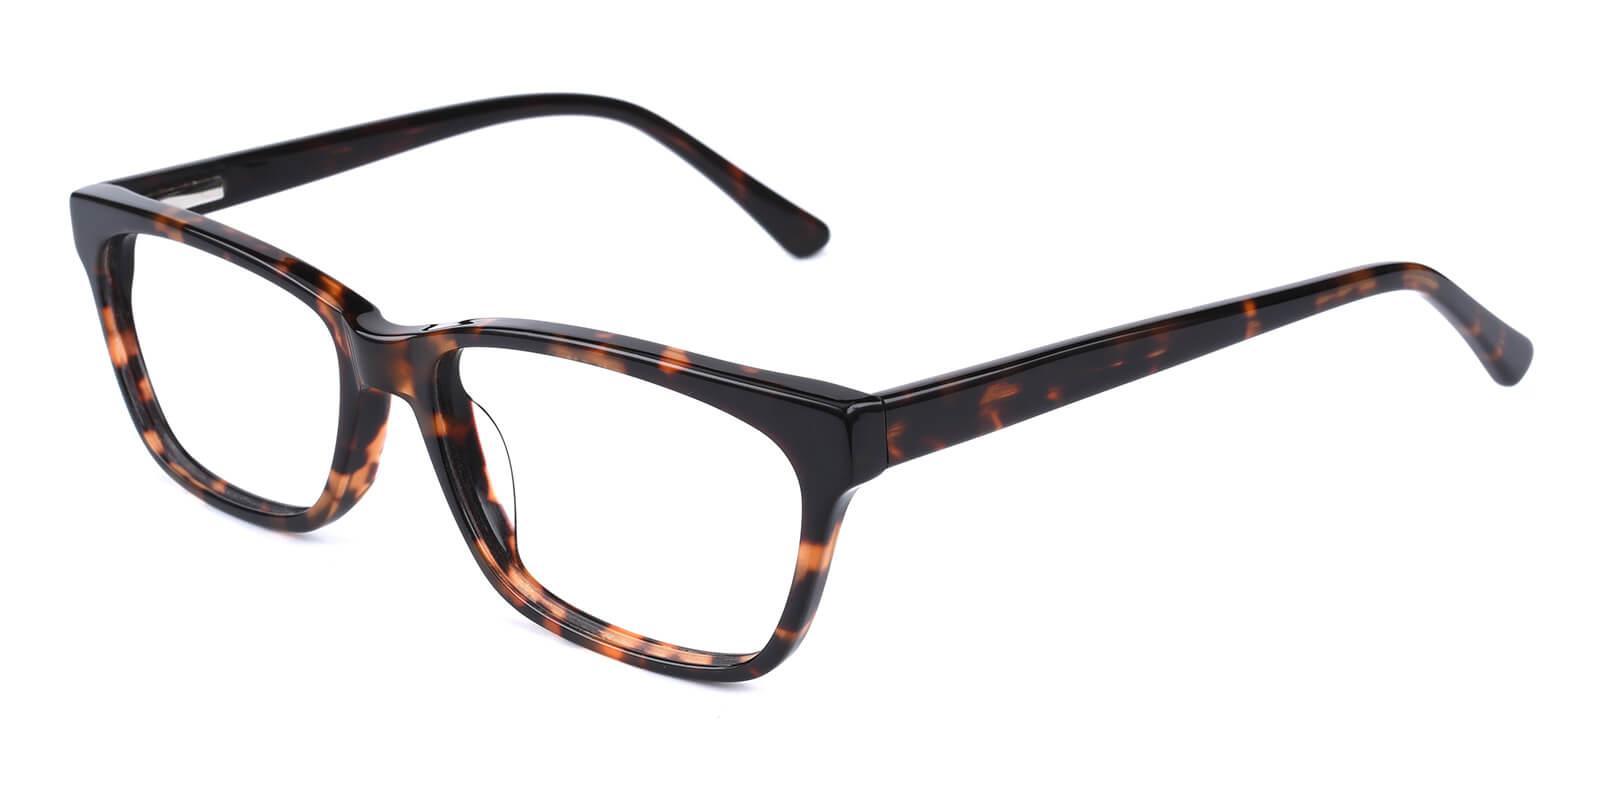 Mizura-Tortoise-Cat-Acetate-Eyeglasses-additional1